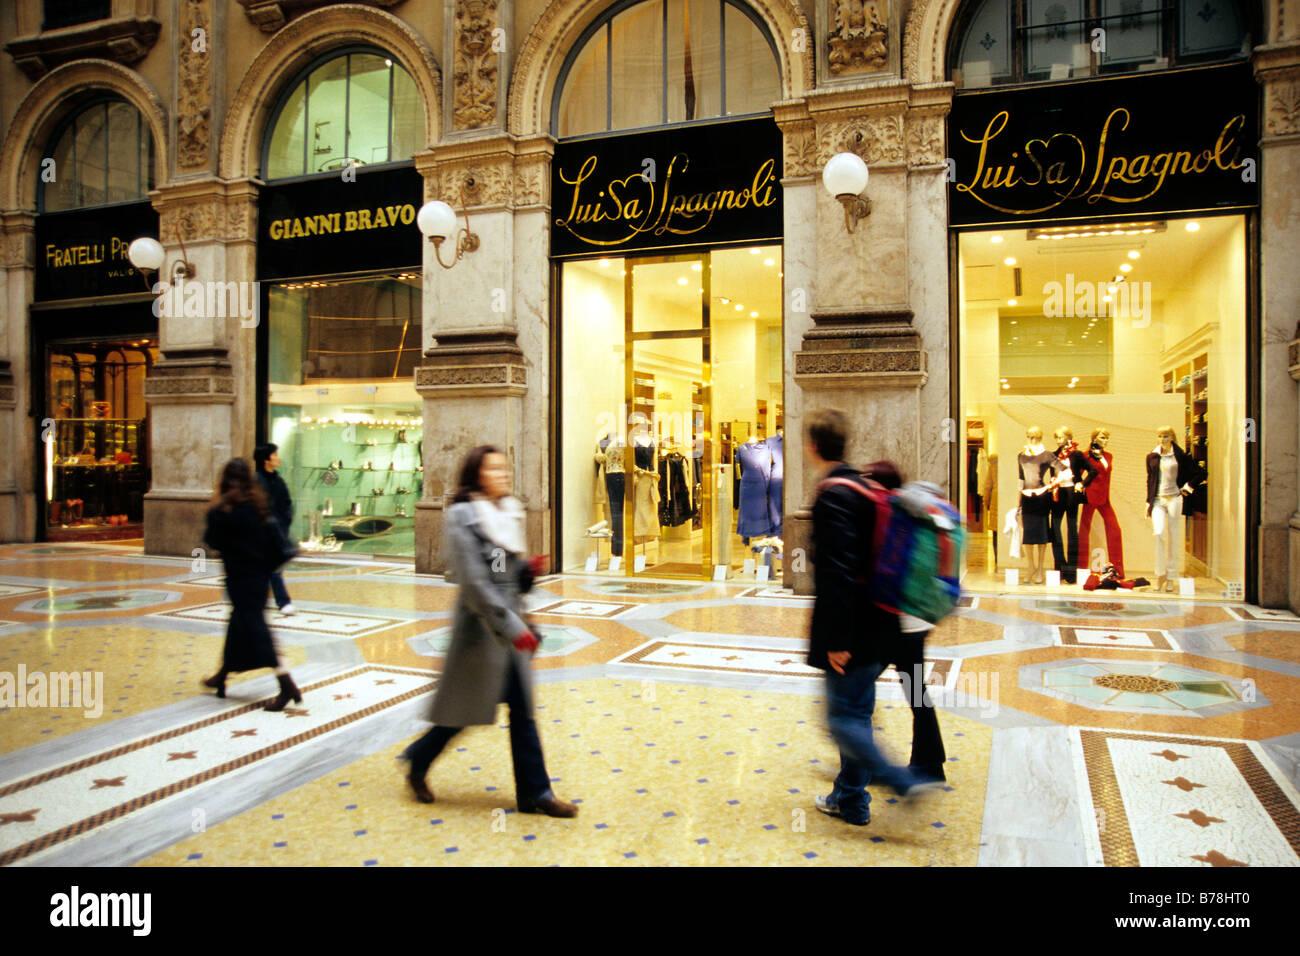 Galleria Vittorio Emanuele Ii Il Salotto Exclusive Gallery Shop